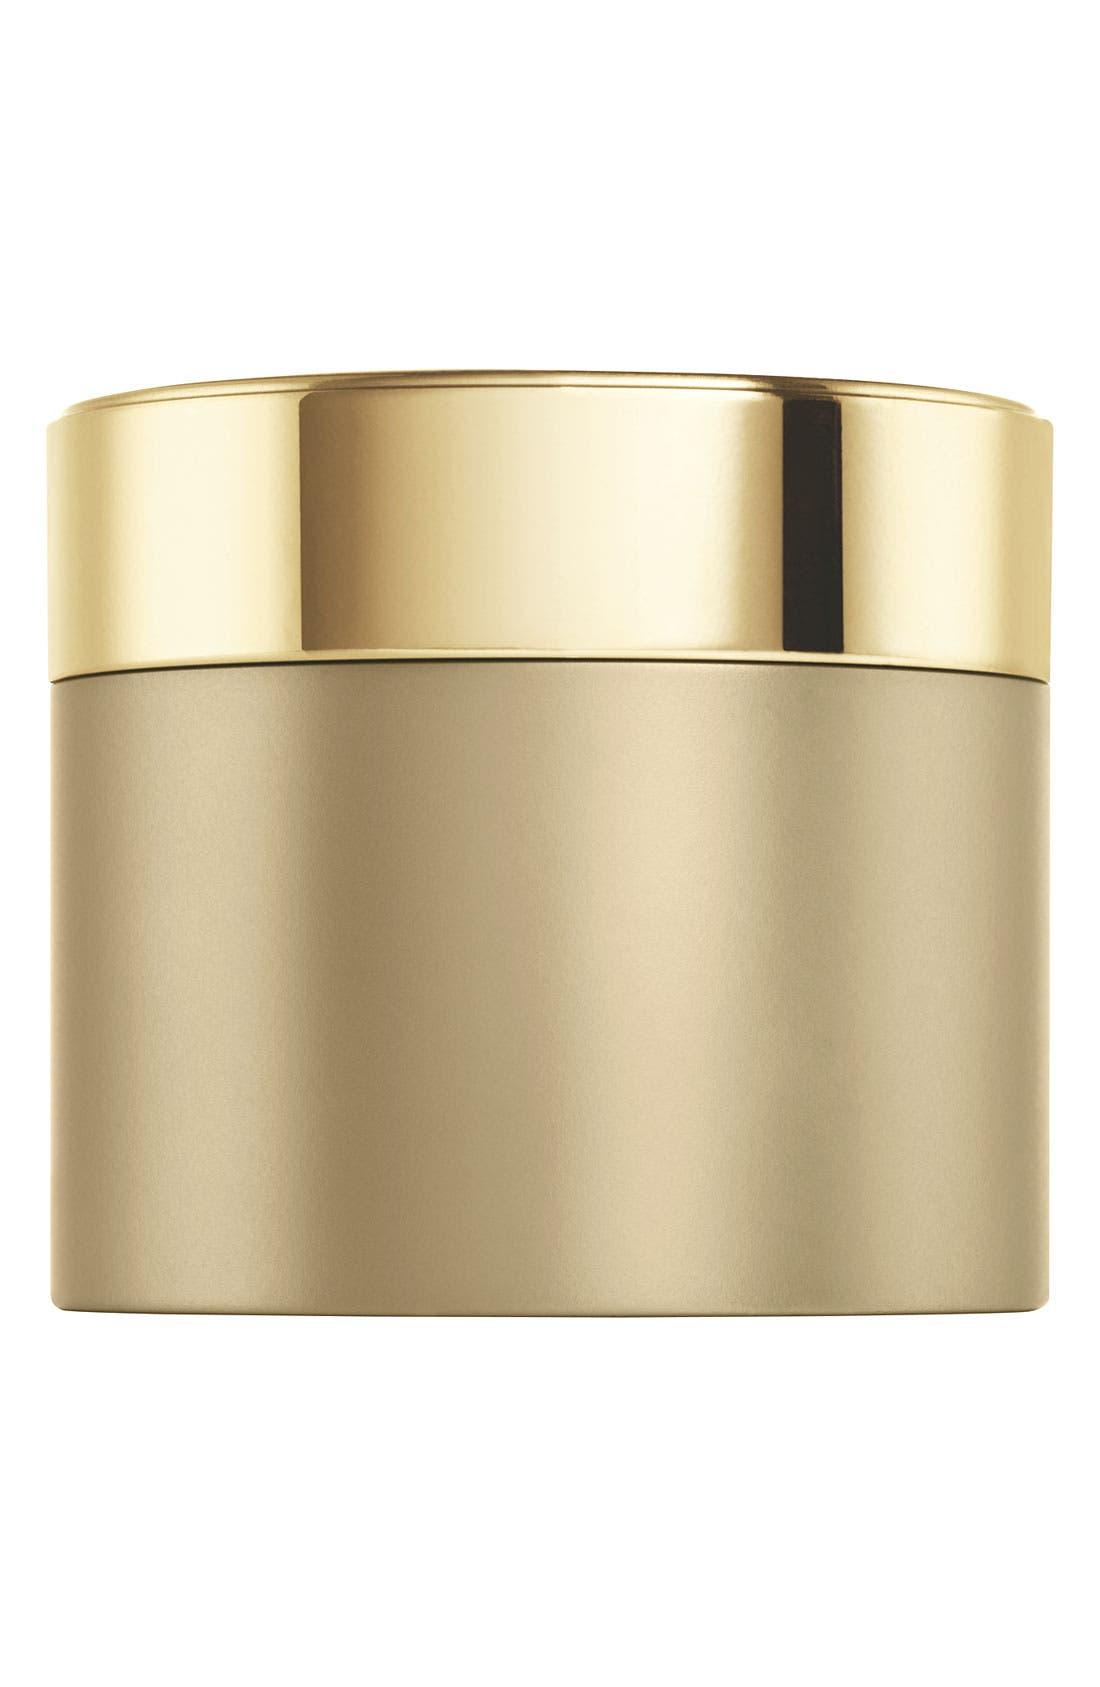 Elizabeth Arden Ceramide Plump Perfect Ultra Lift & Firm Eye Cream SPF 15